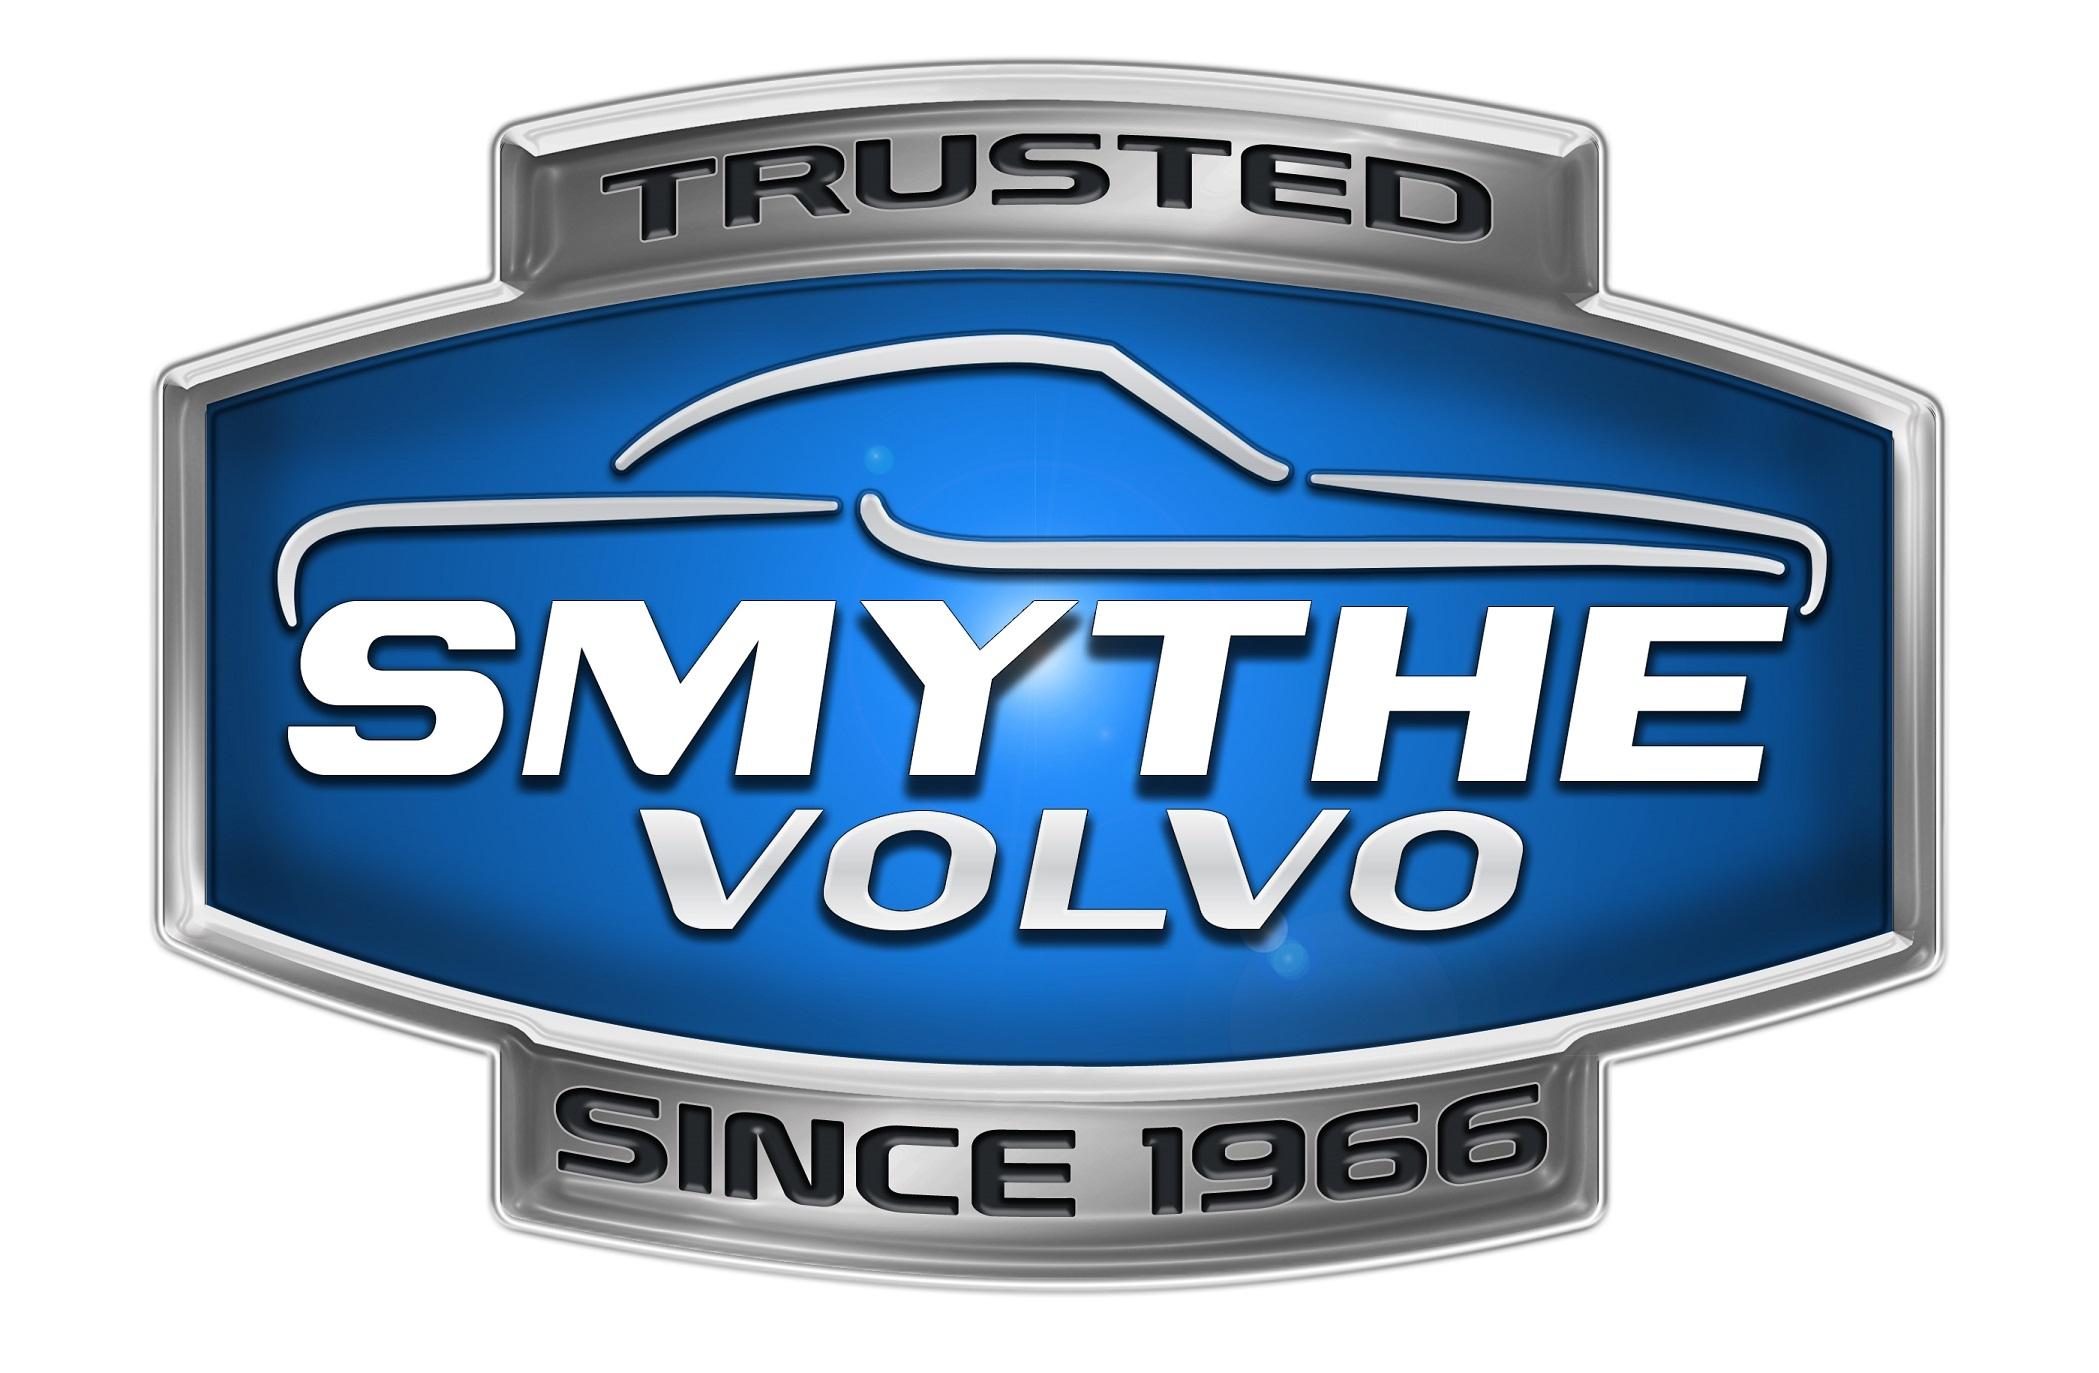 Smythe volvo summit new jersey insider pages for Smythe mercedes benz